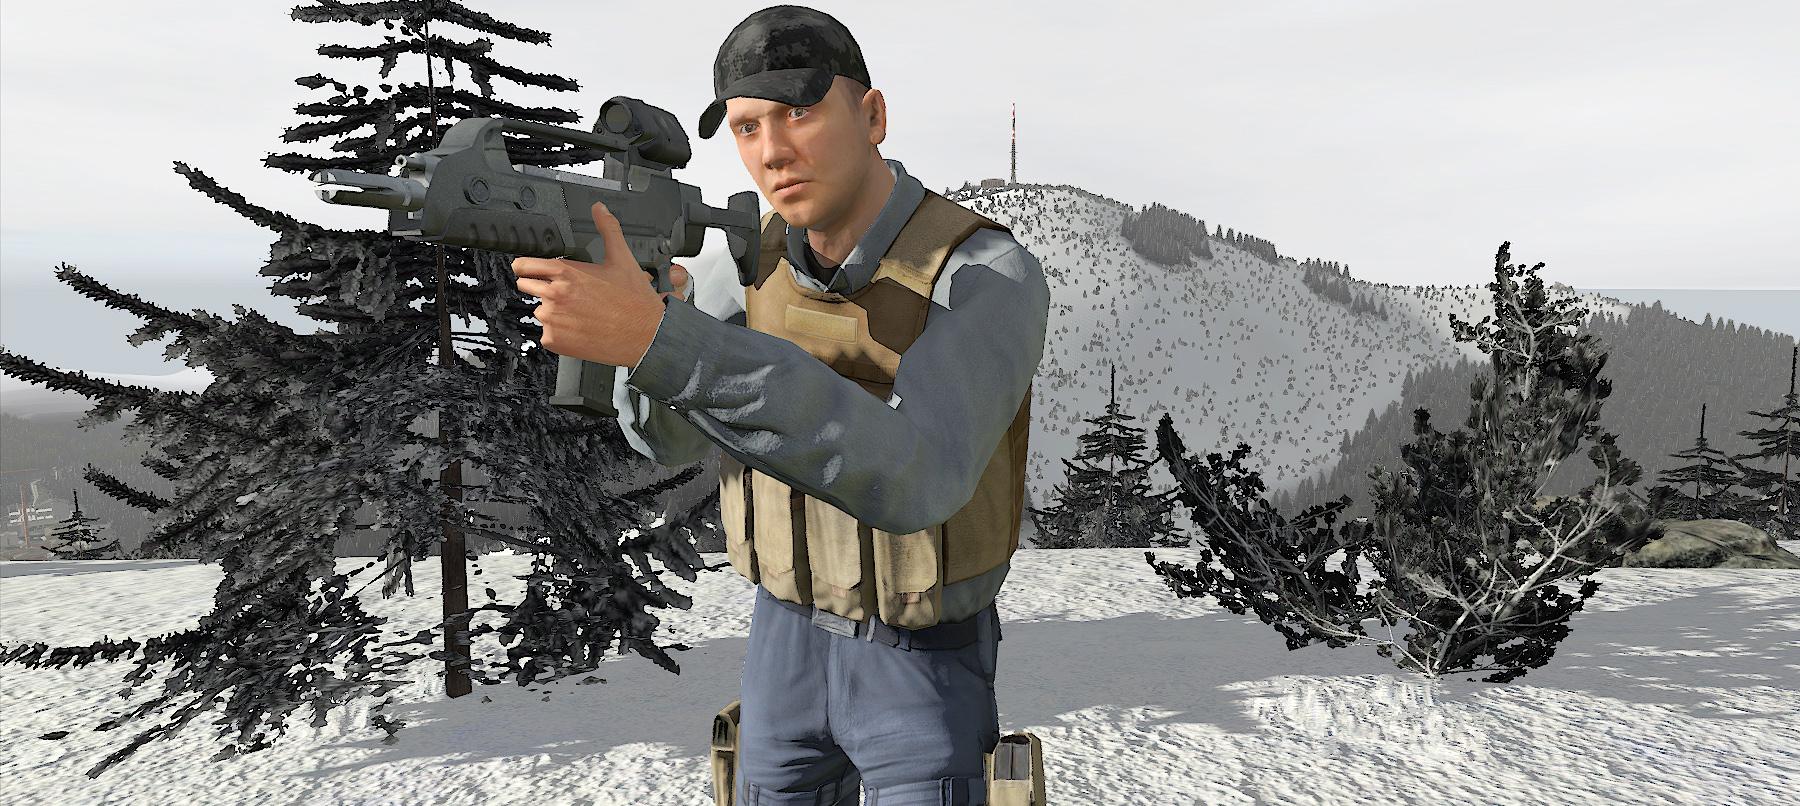 Will this winter wonderland be DayZ's next map? | PC Gamer